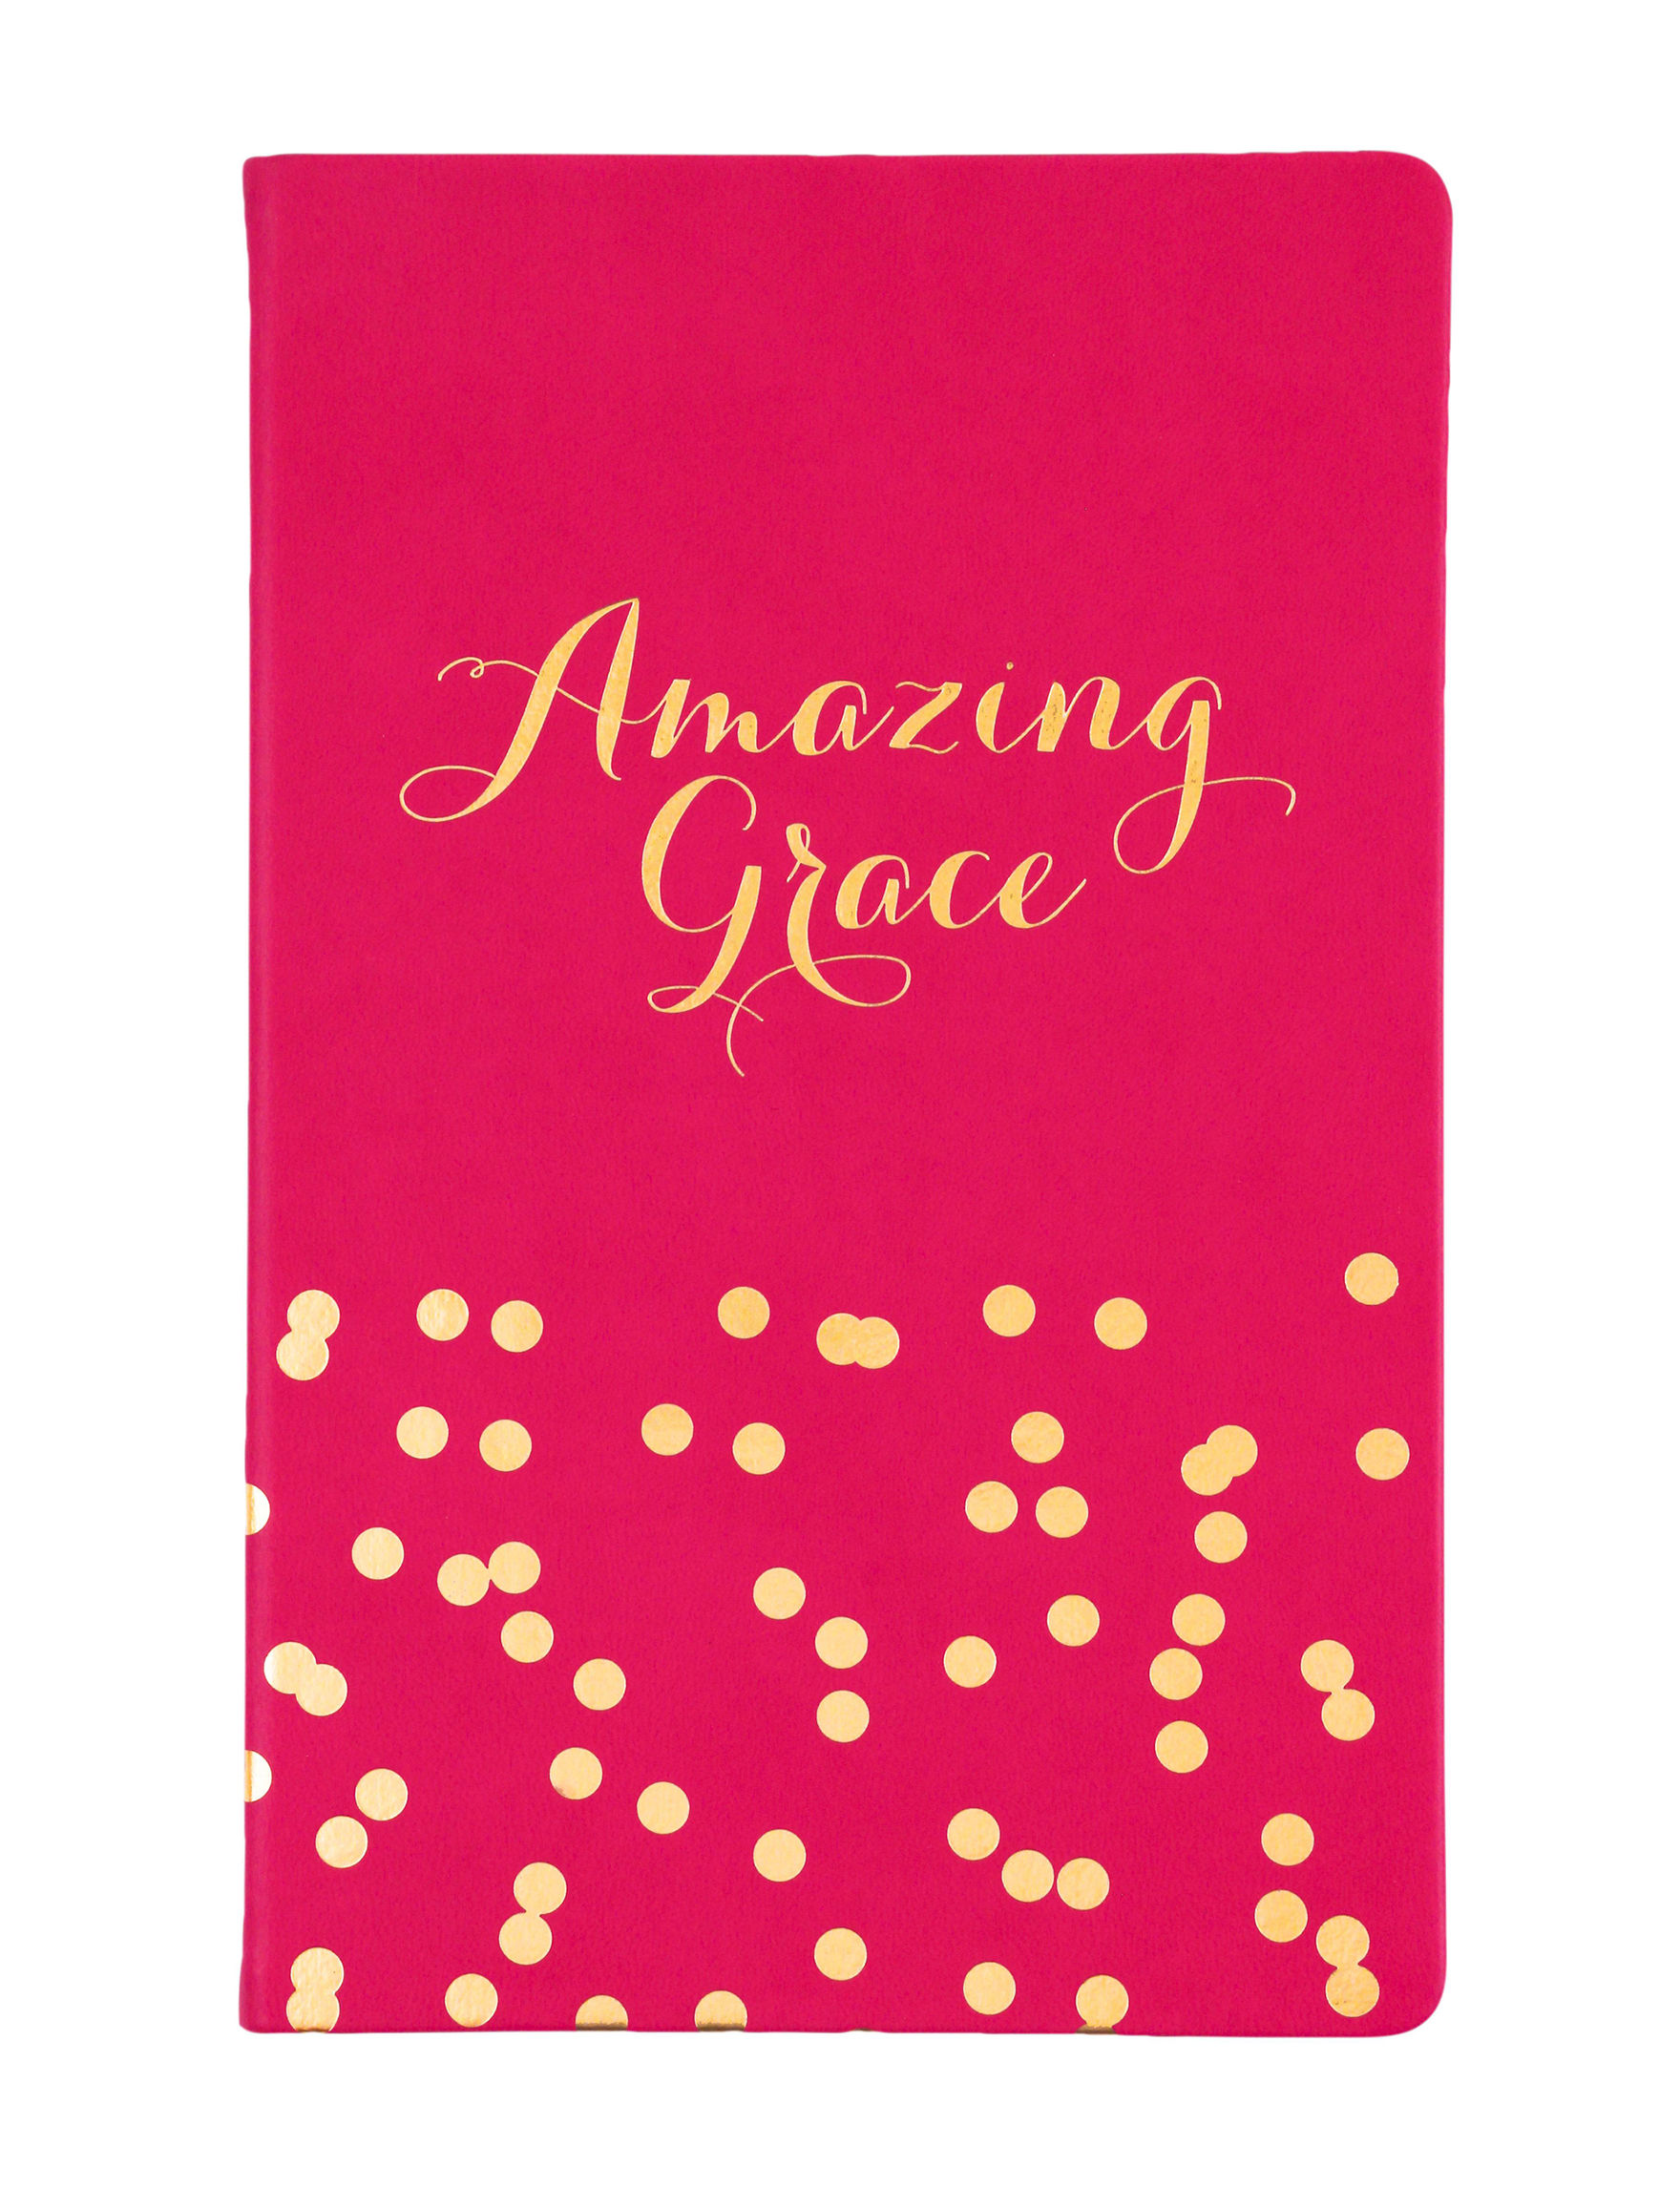 Eccolo Pink Journals & Notepads School & Office Supplies